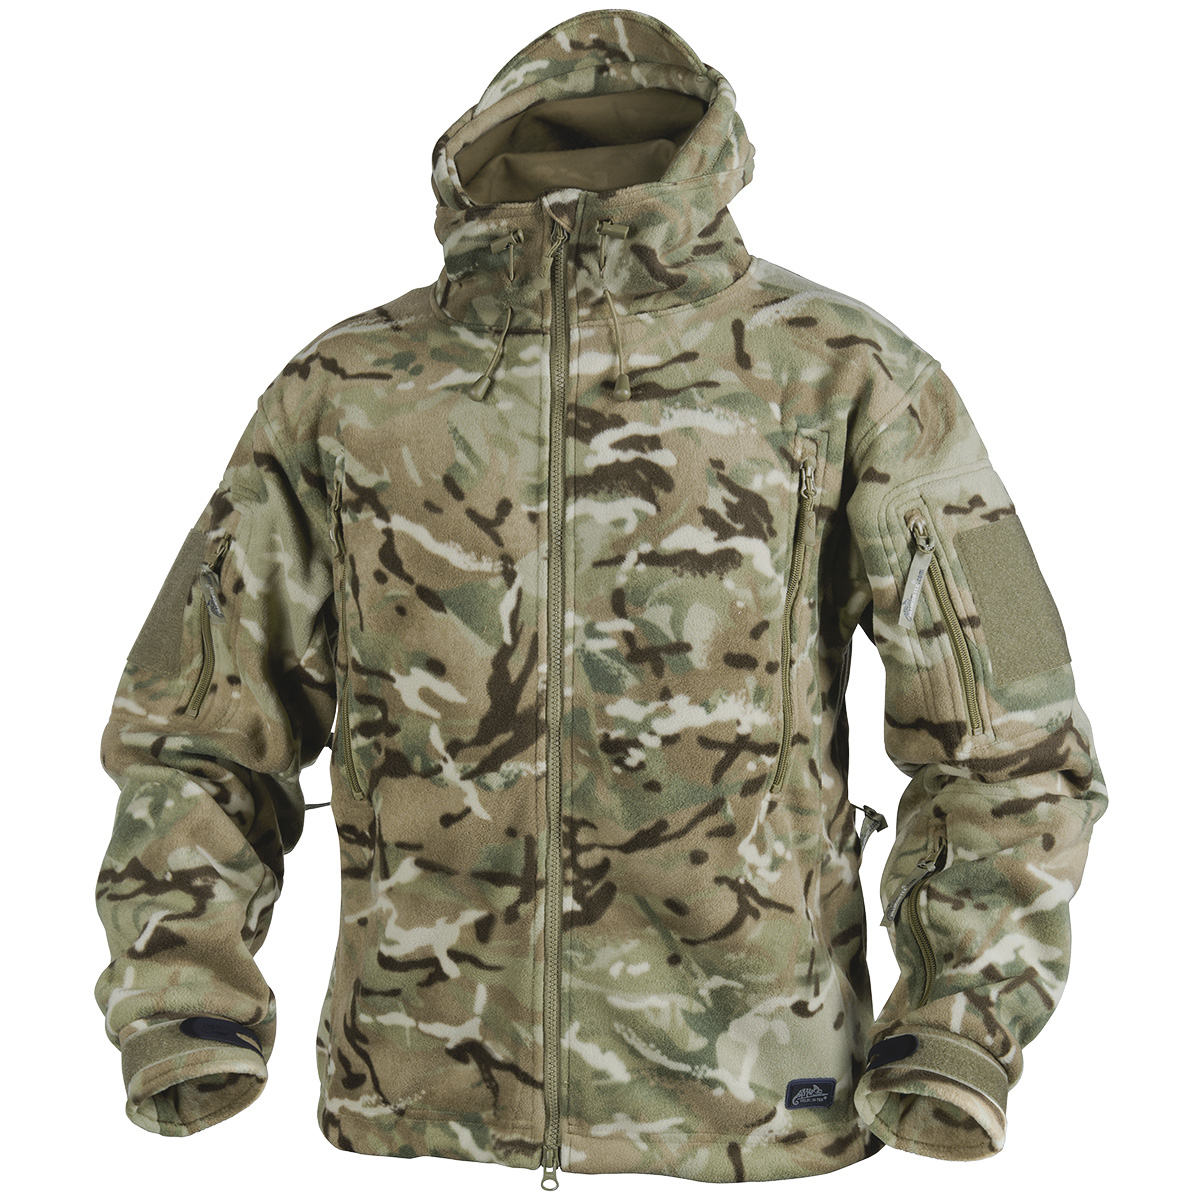 helikon patriot tactical hooded jacket double warm polar hunting fleece mtp camo ebay. Black Bedroom Furniture Sets. Home Design Ideas